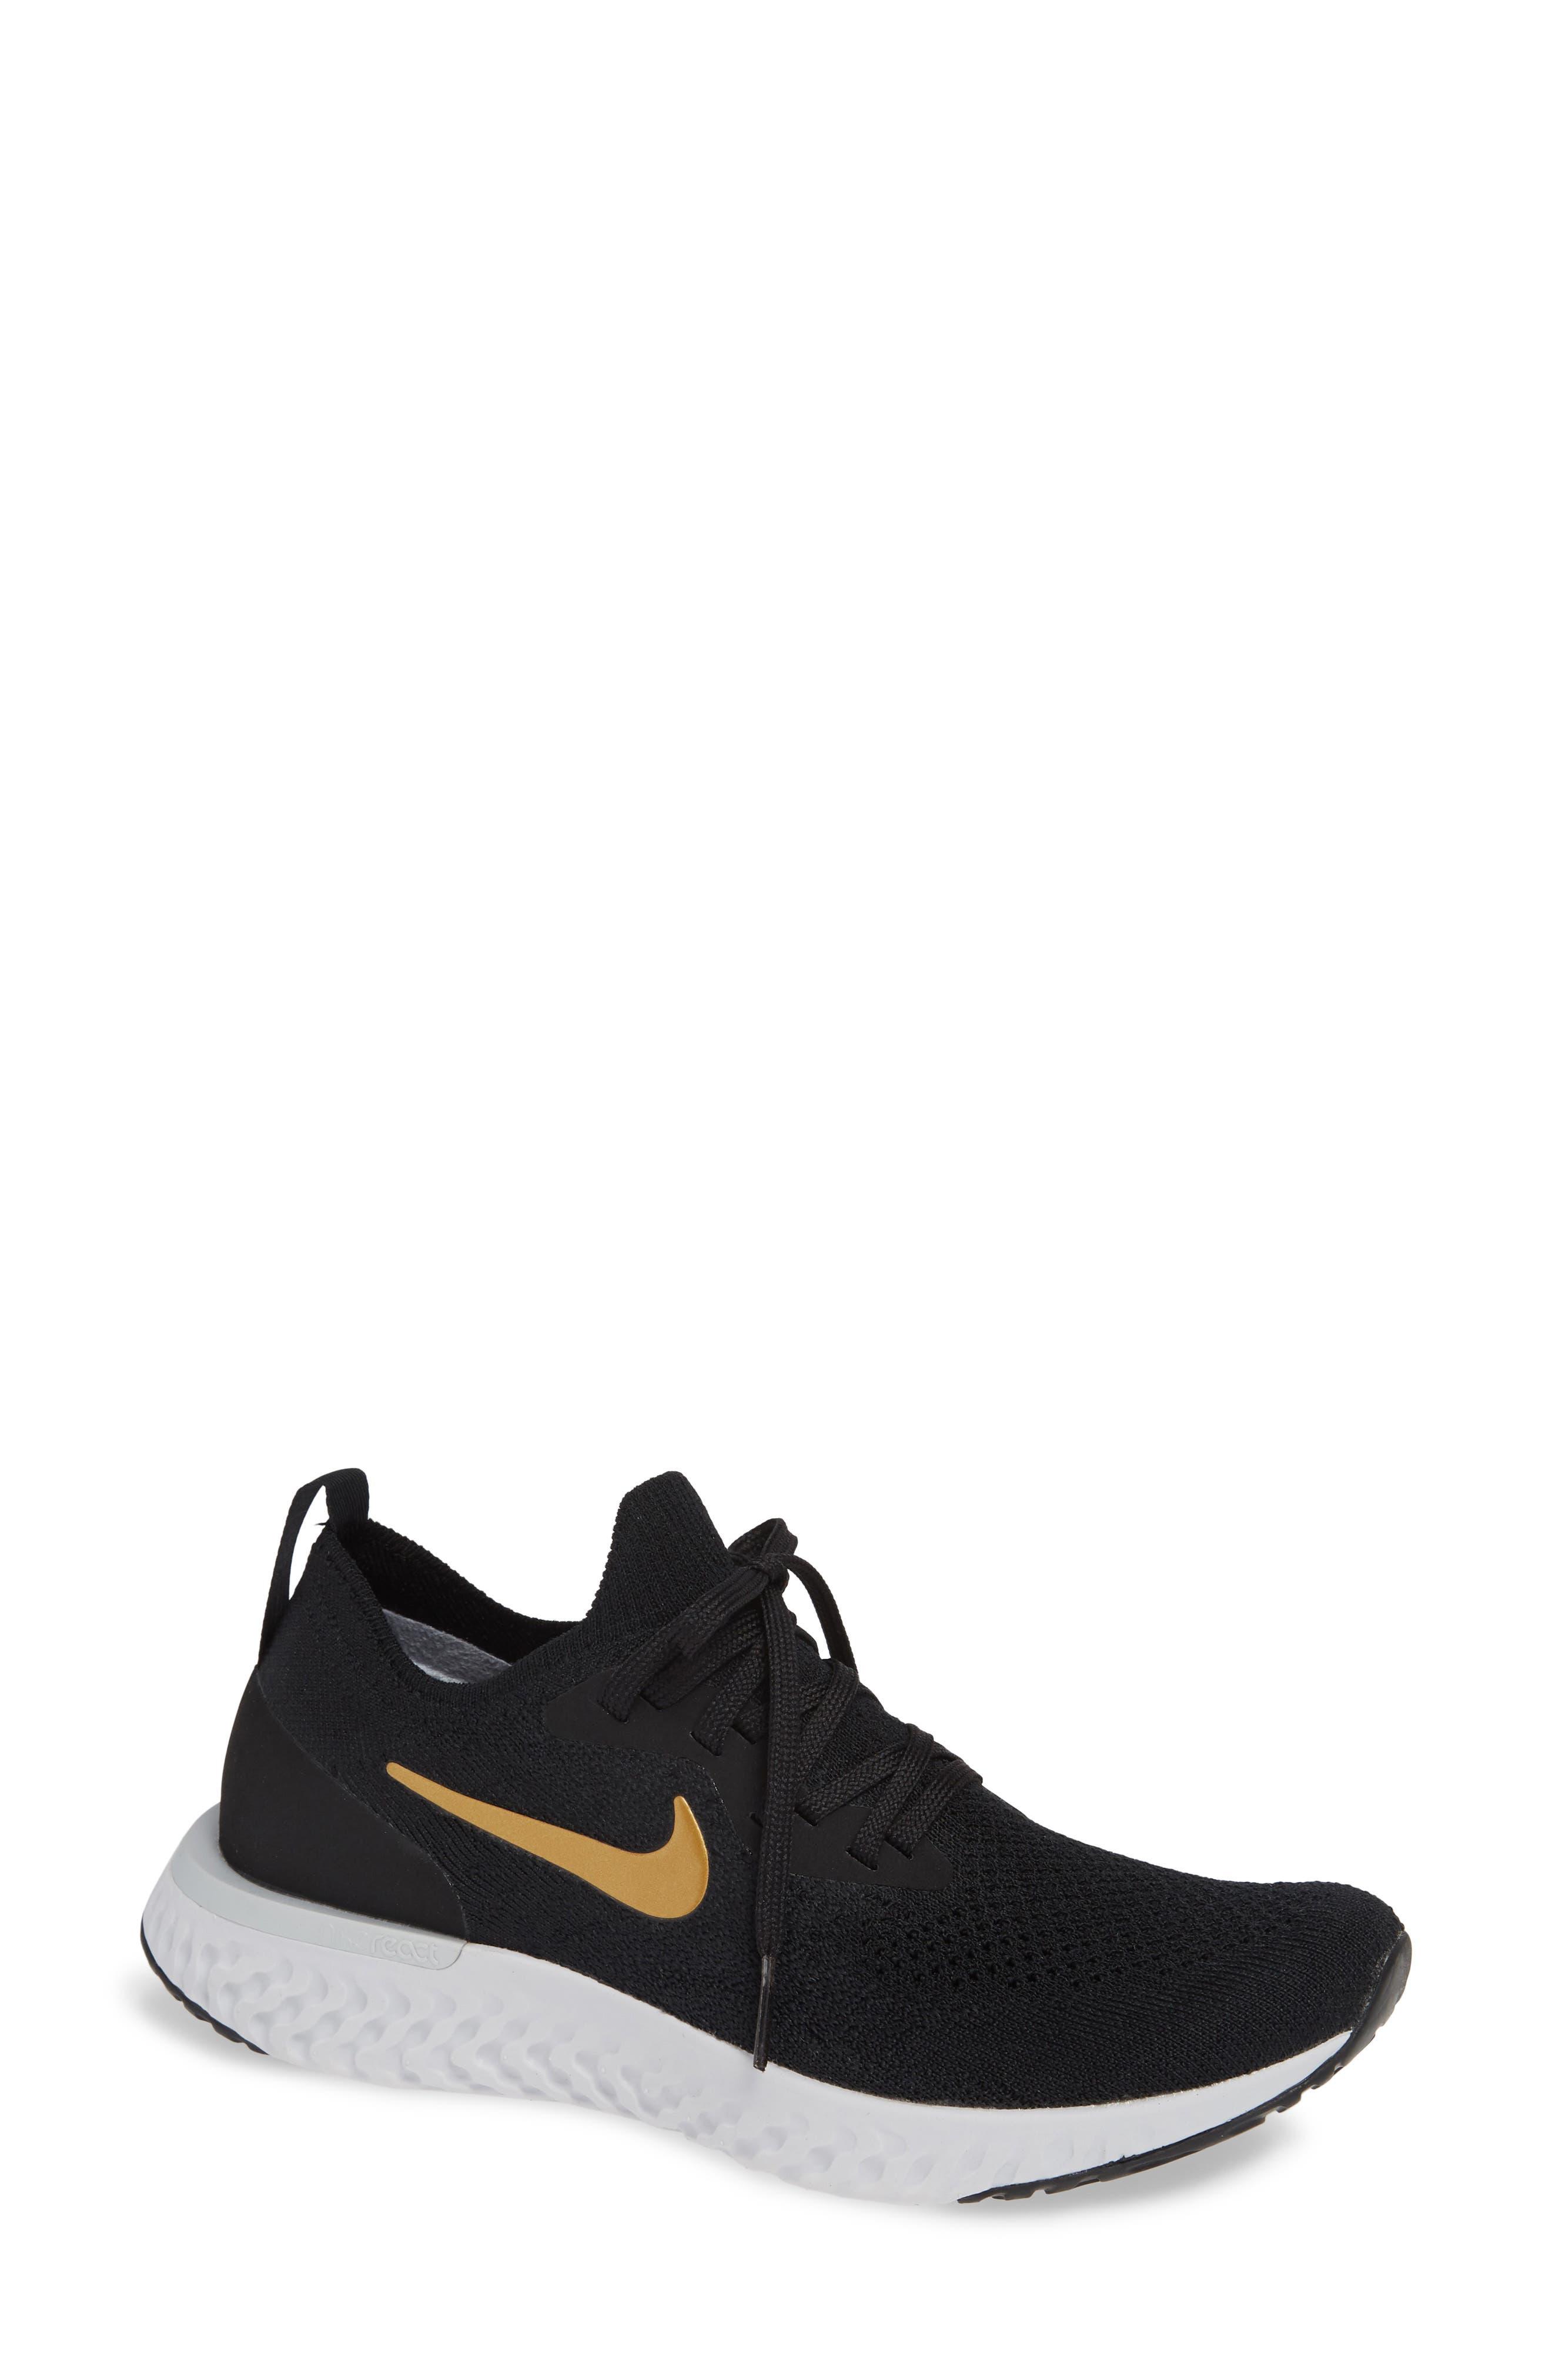 on sale a7582 8174d ... netherlands nike epic react flyknit running shoe women 5f93f a839f